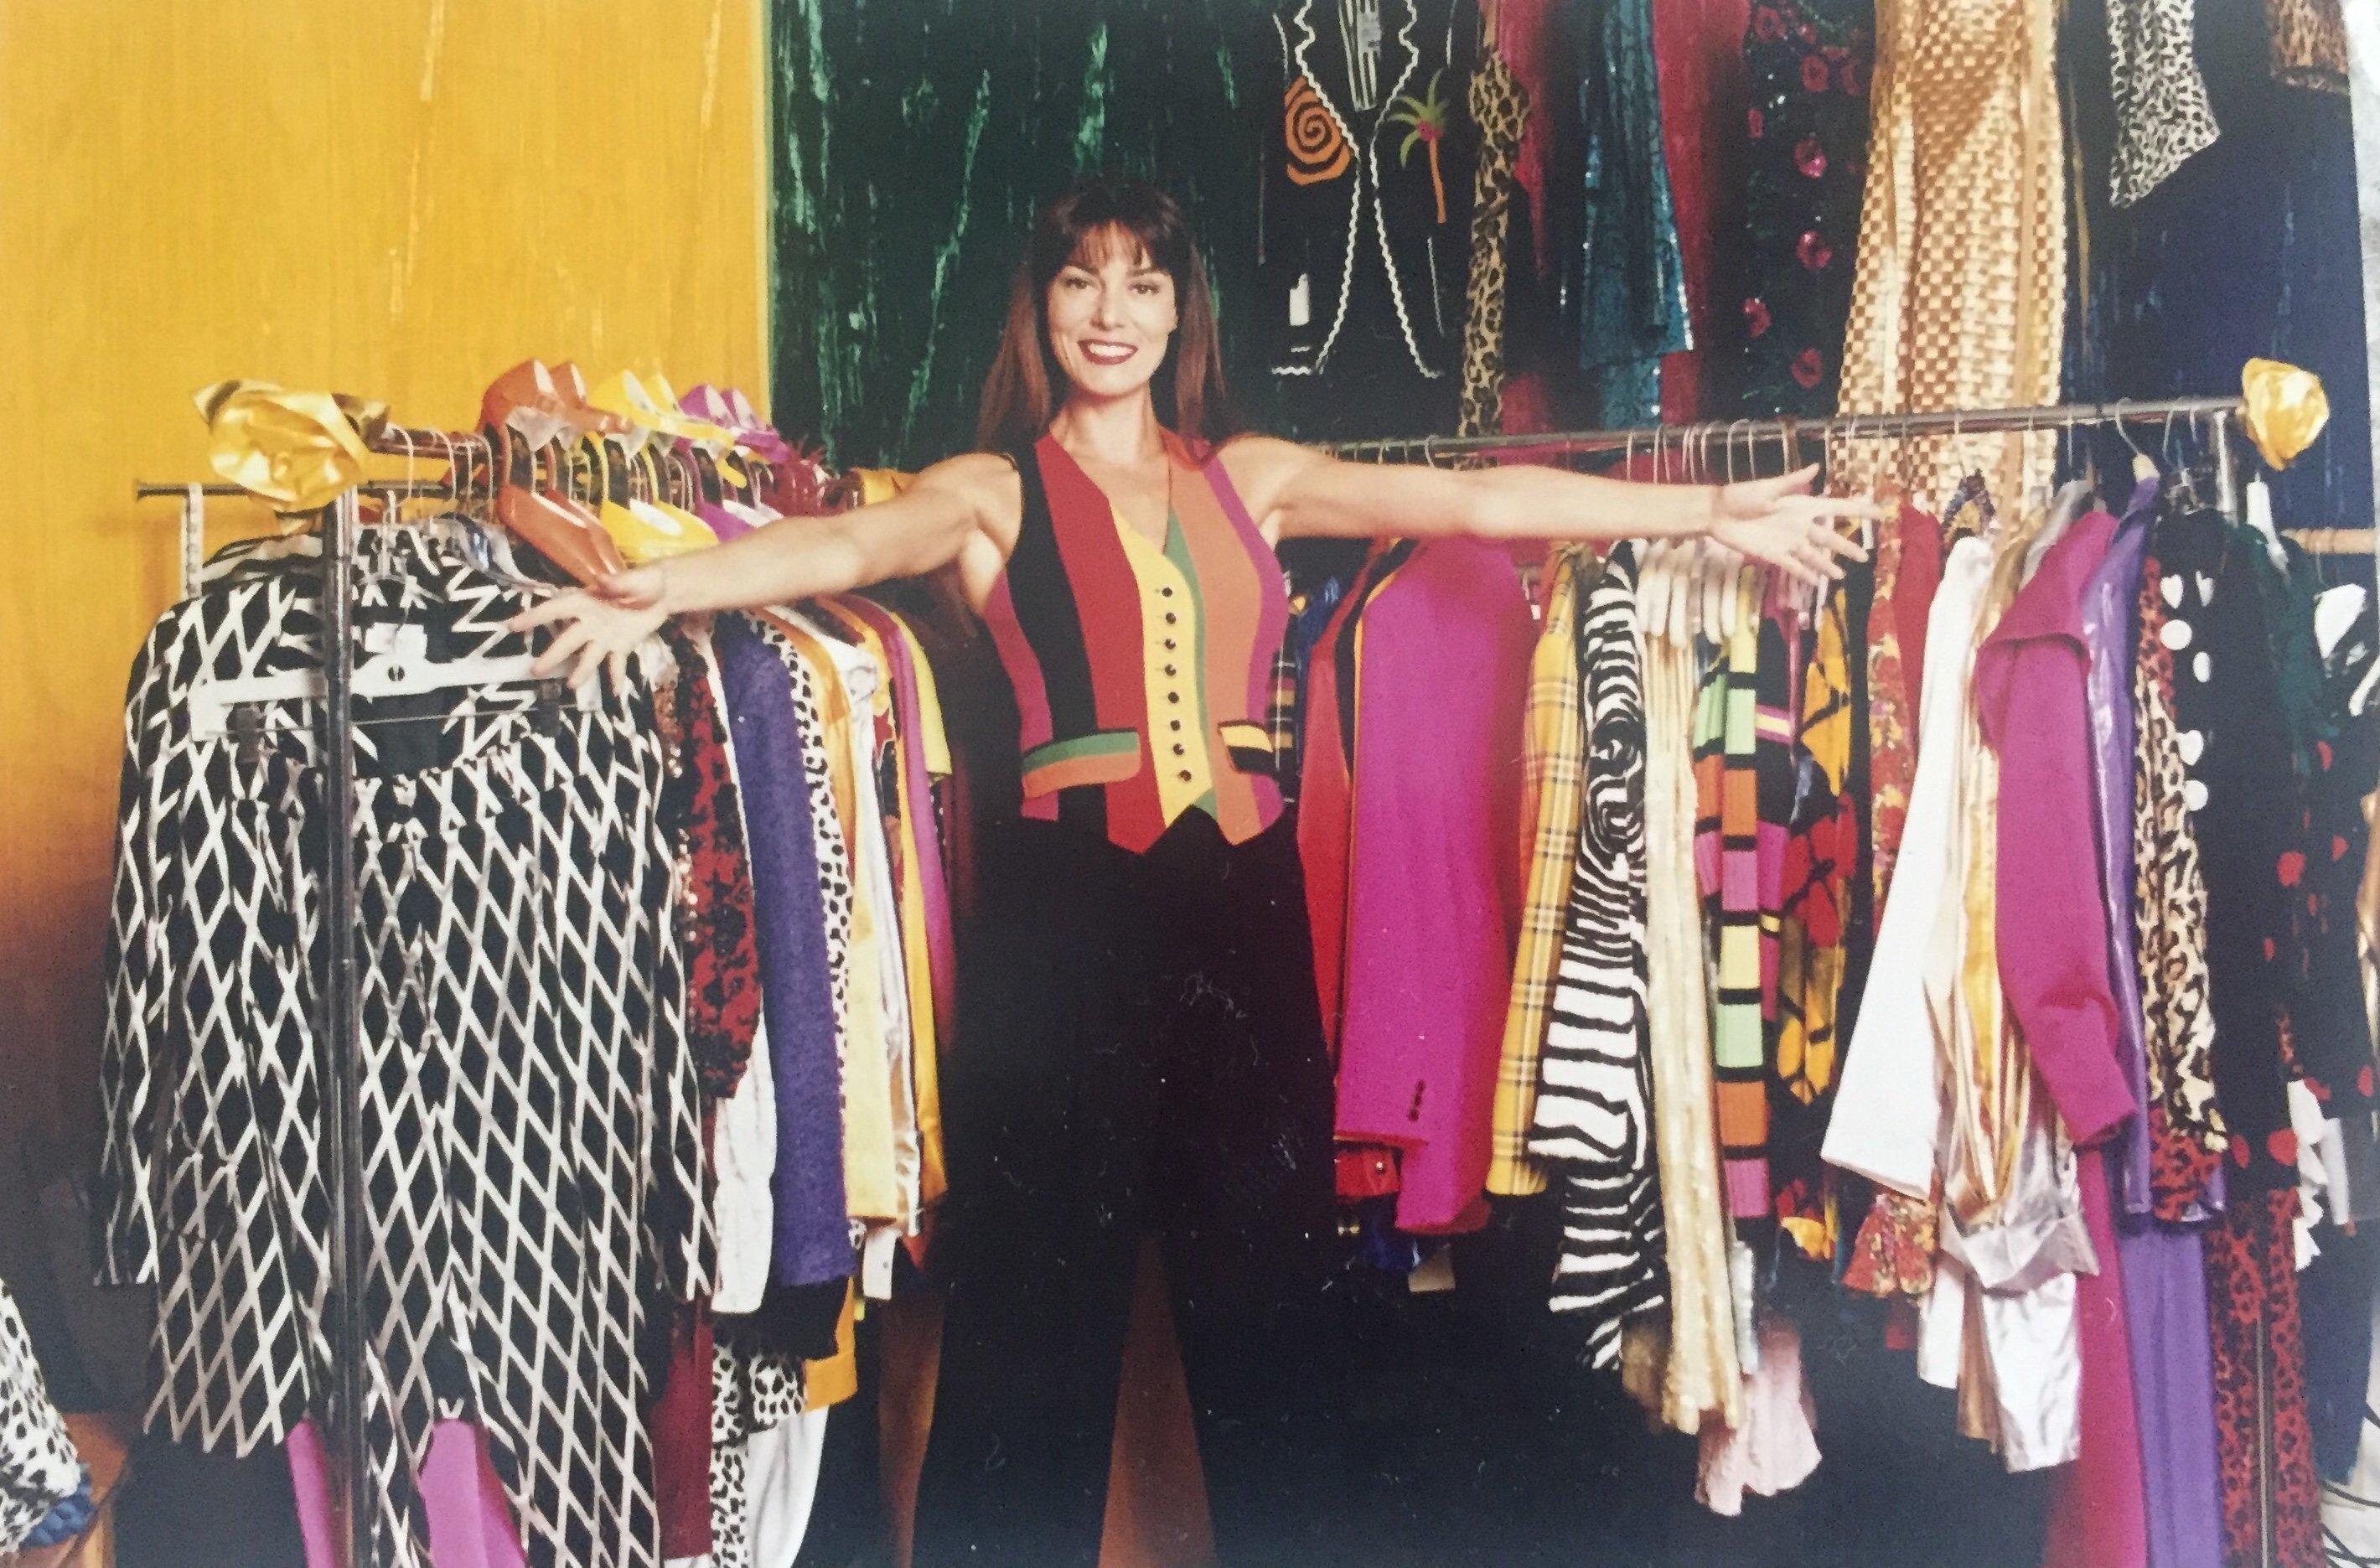 The Secret History Of That Iconic 'Nanny' Wardrobe | HuffPost